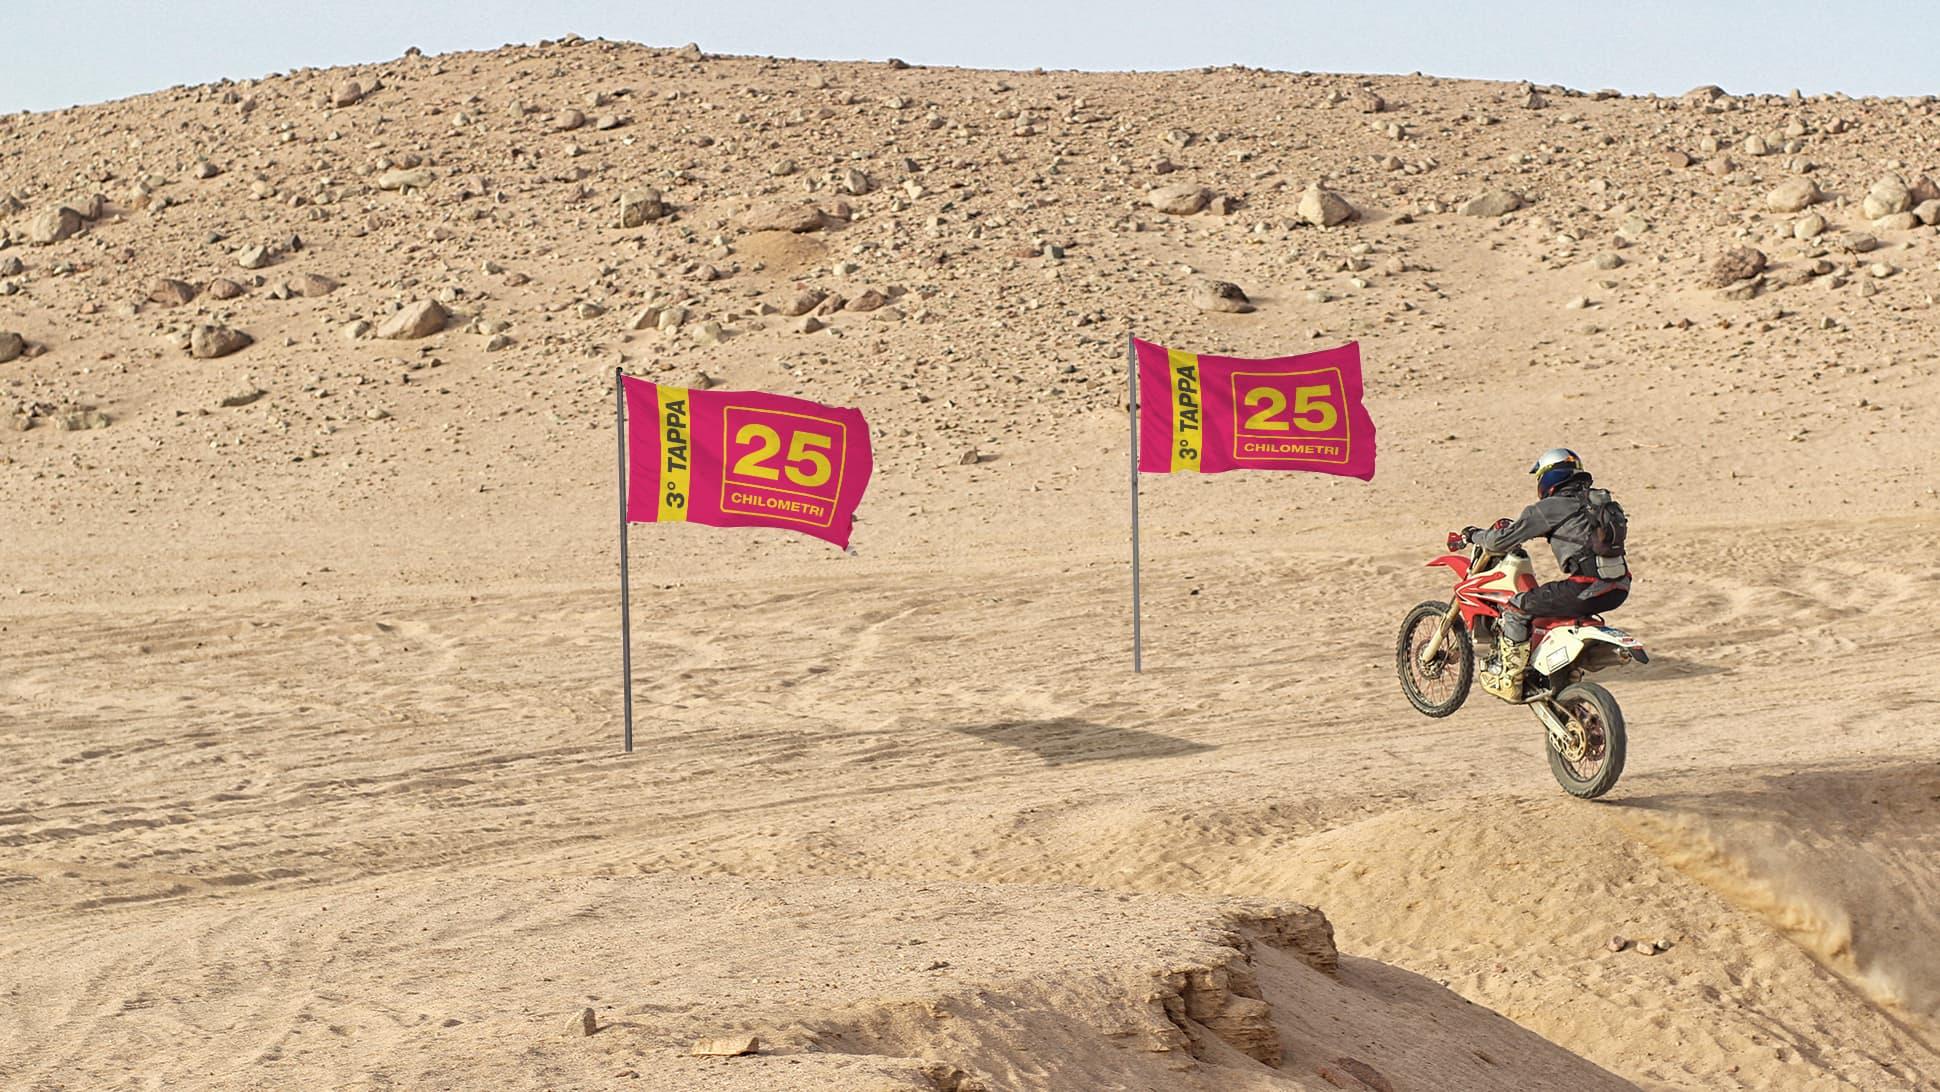 Bandiere fluo per eventi sportivi | tictac.it